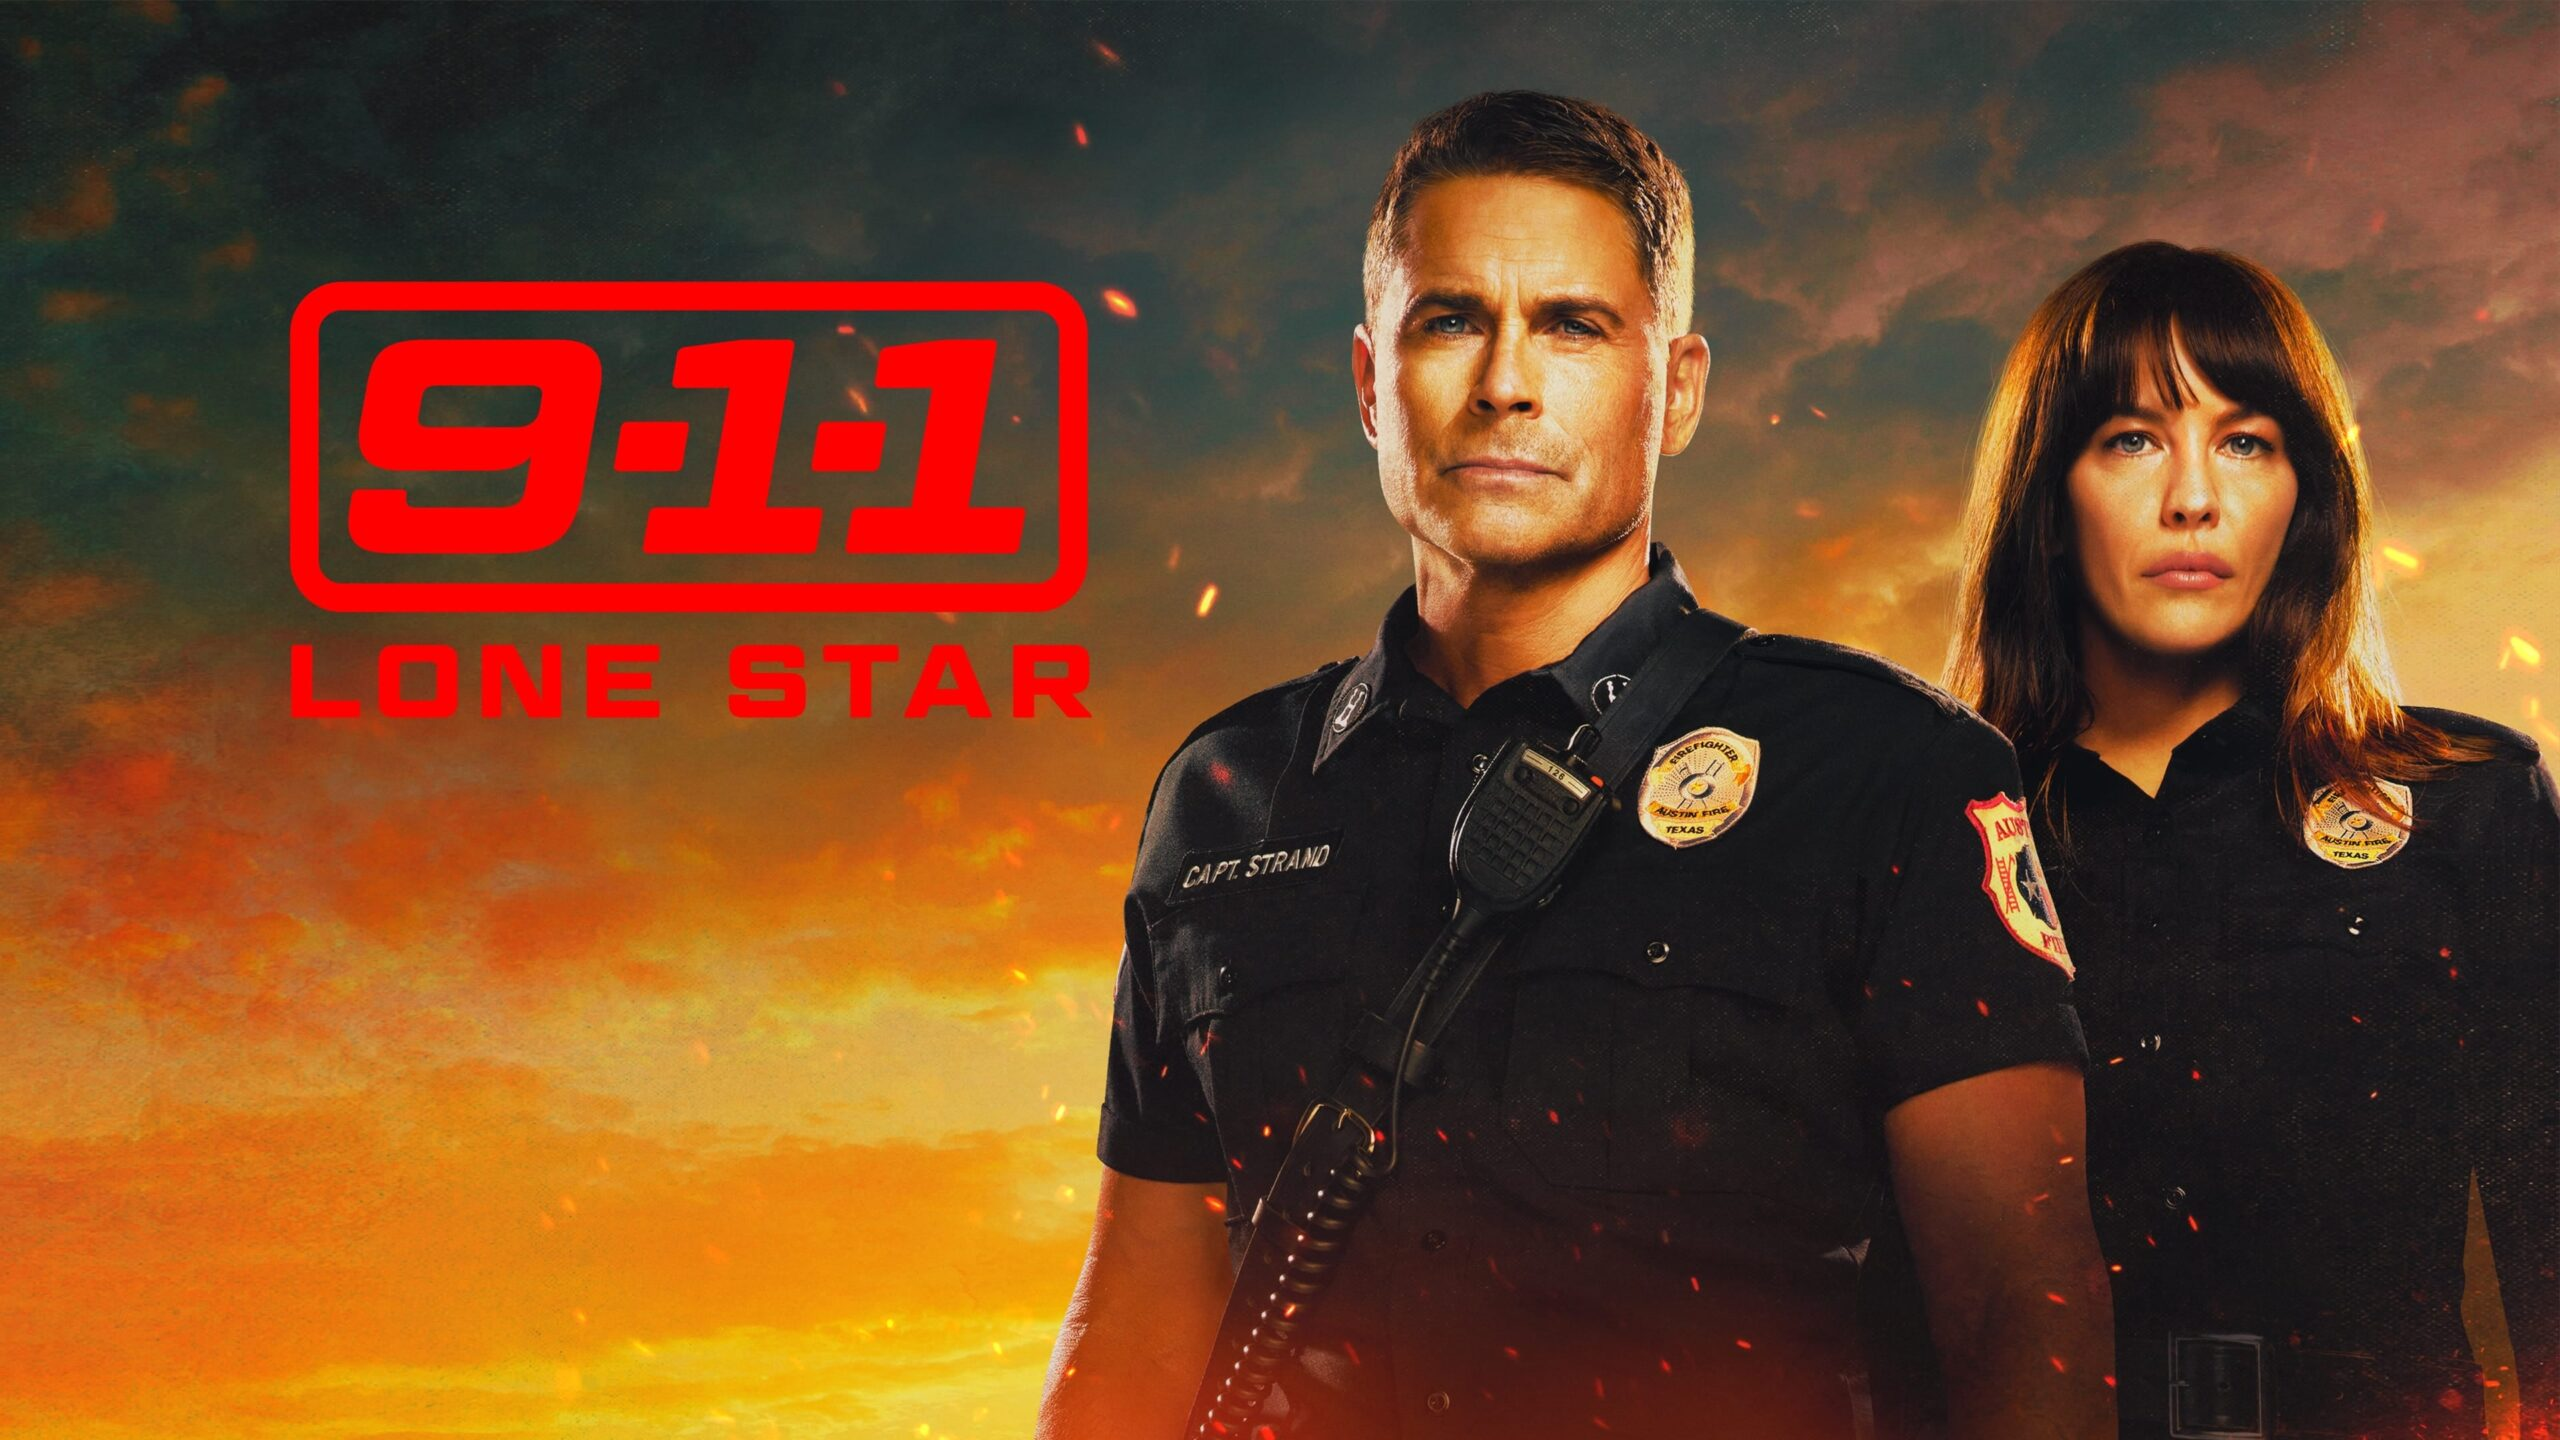 720p~ 9-1-1: Lone Star Season 2 Episode 4